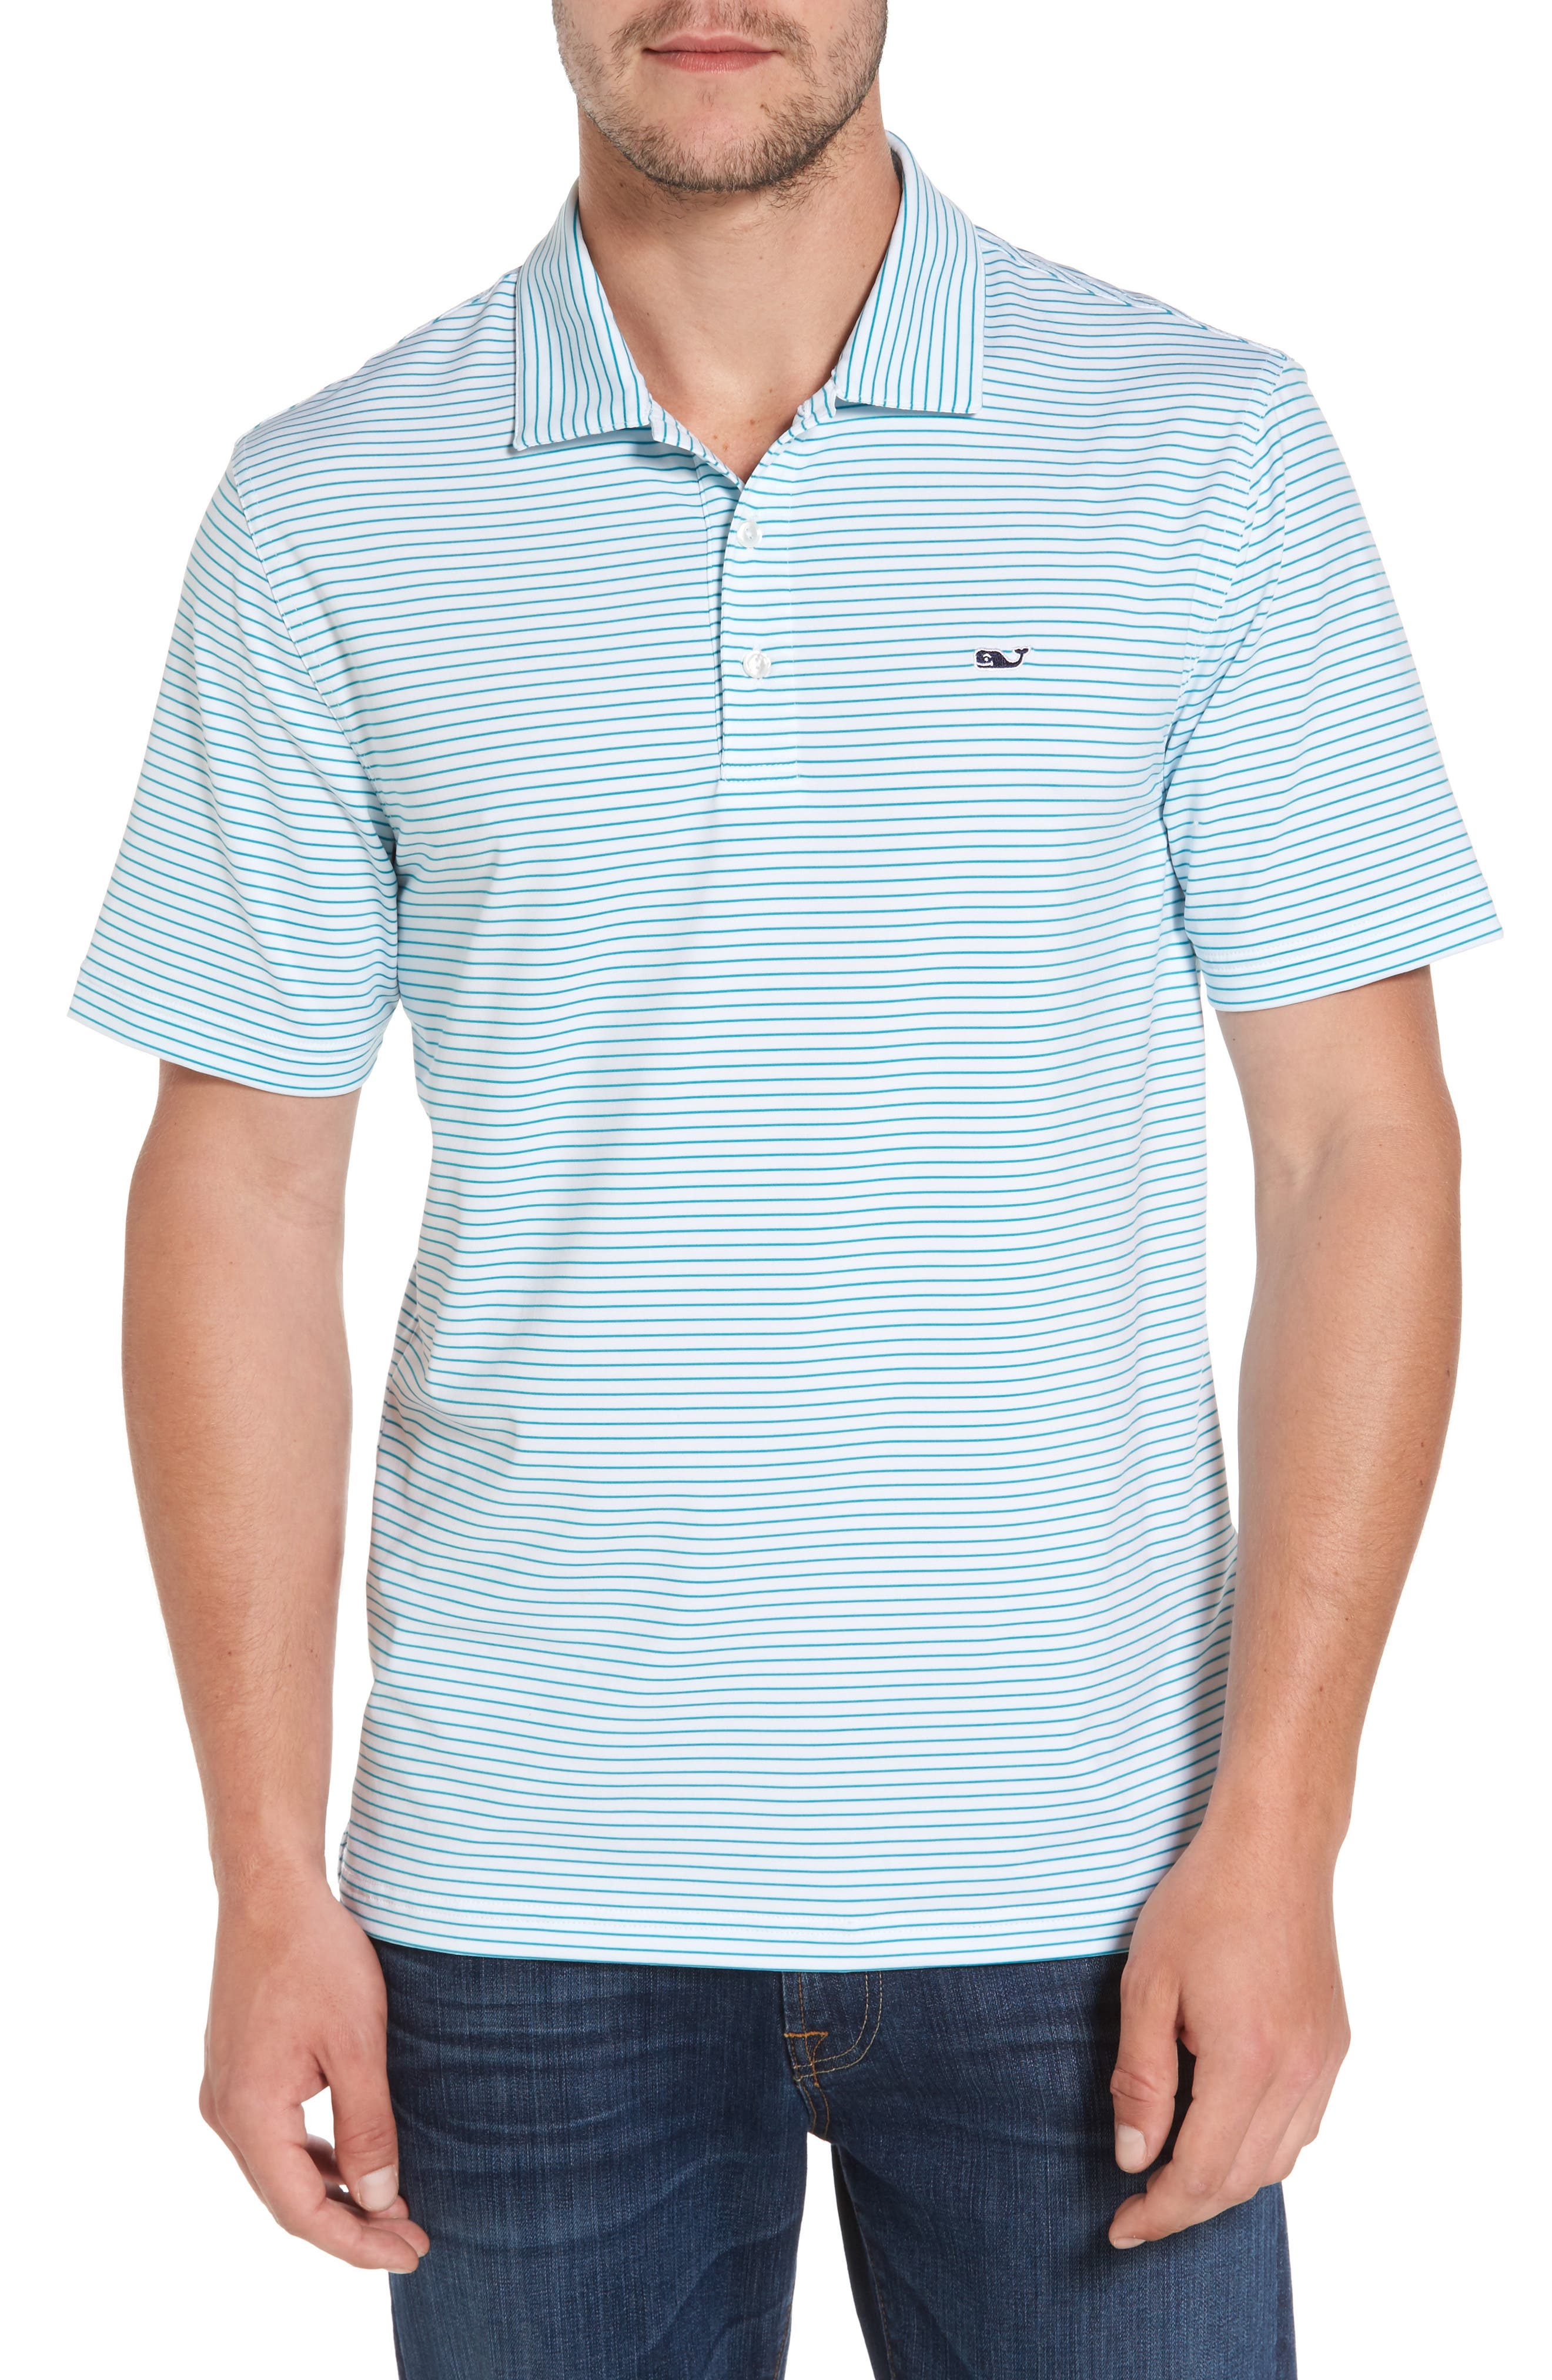 Vineyard Vines 'Wilson' Stripe Jersey Polo